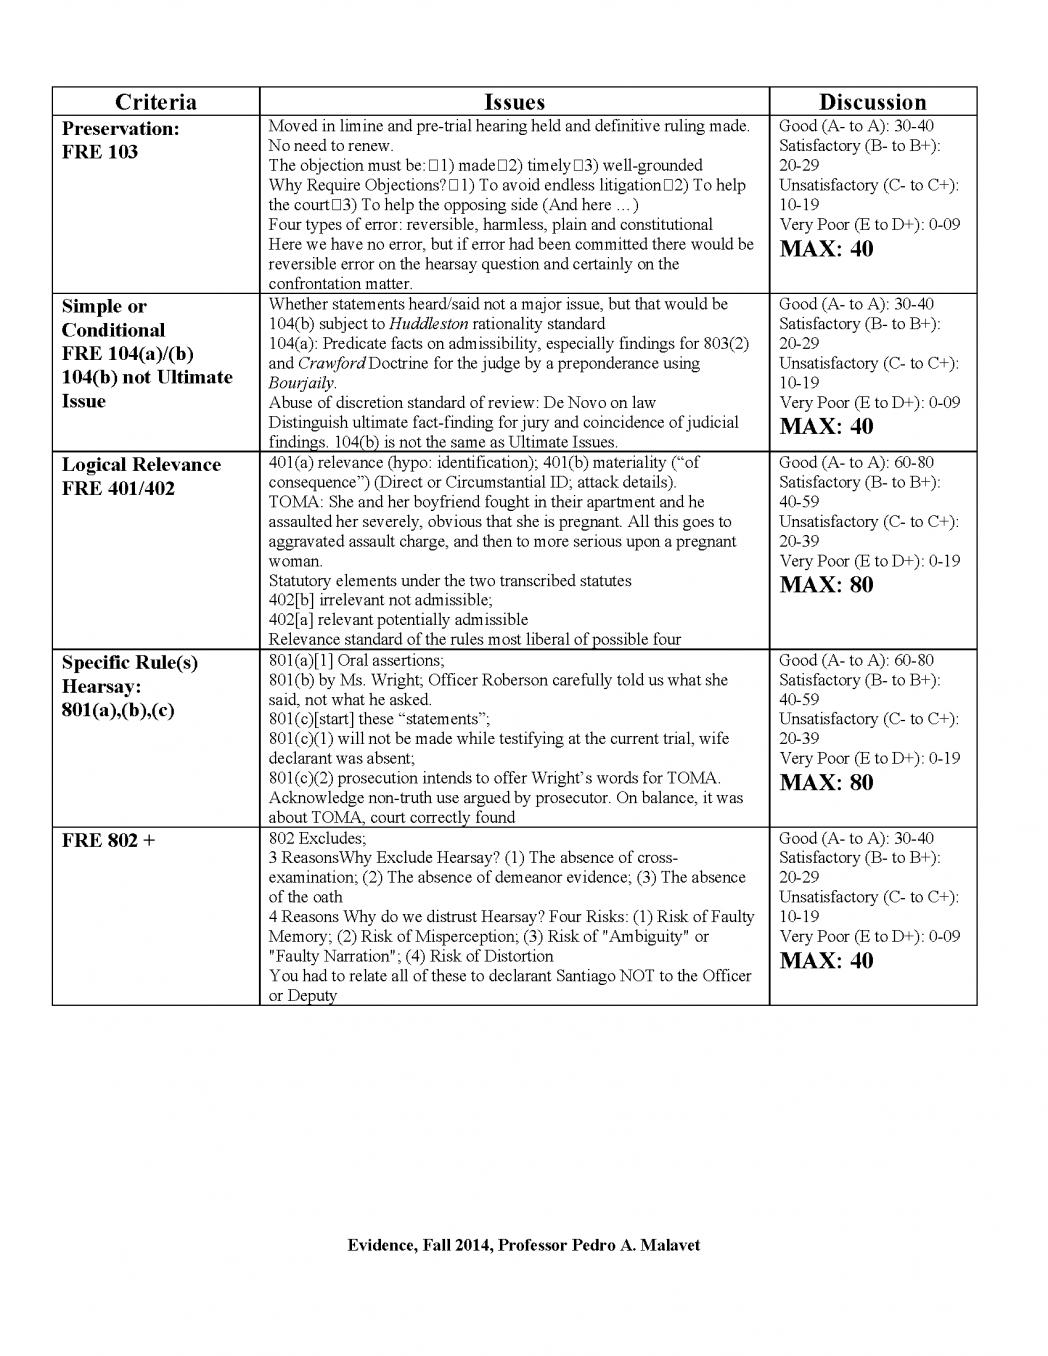 004 Grading Essays Essay Rubric University Best Images About College Grader Free Malavet Evidence Fall 2014 P Board Scoring Gradesaver 1048x1356 Example Sensational Online For Teachers Paper Students Full